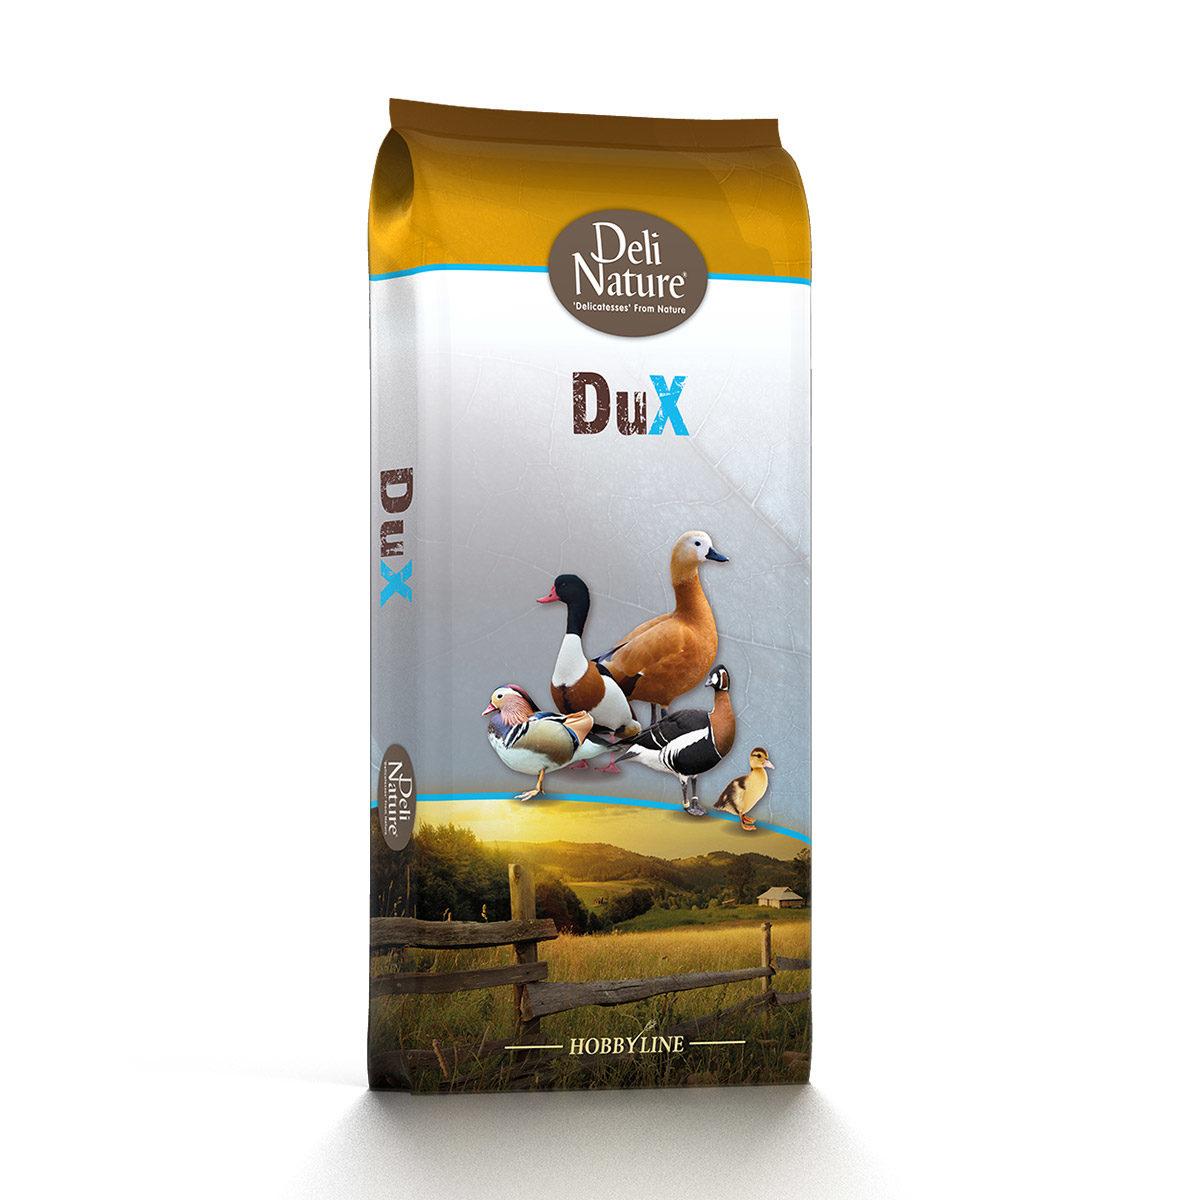 Deli Nature DuX-Onderhoud-Pellet 20kg